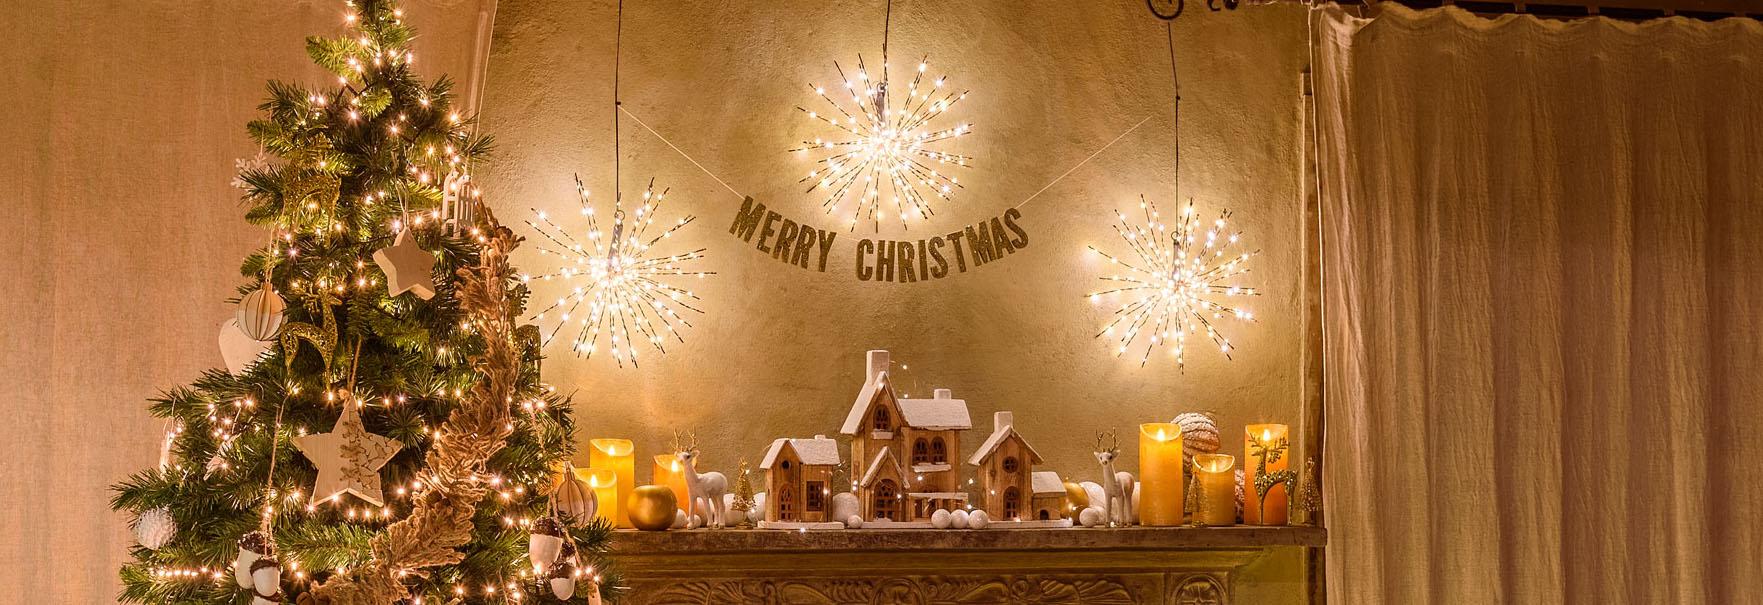 Addobbi Natalizi X Negozi.18 Idee Per Alberi Di Natale Originali Luminal Park